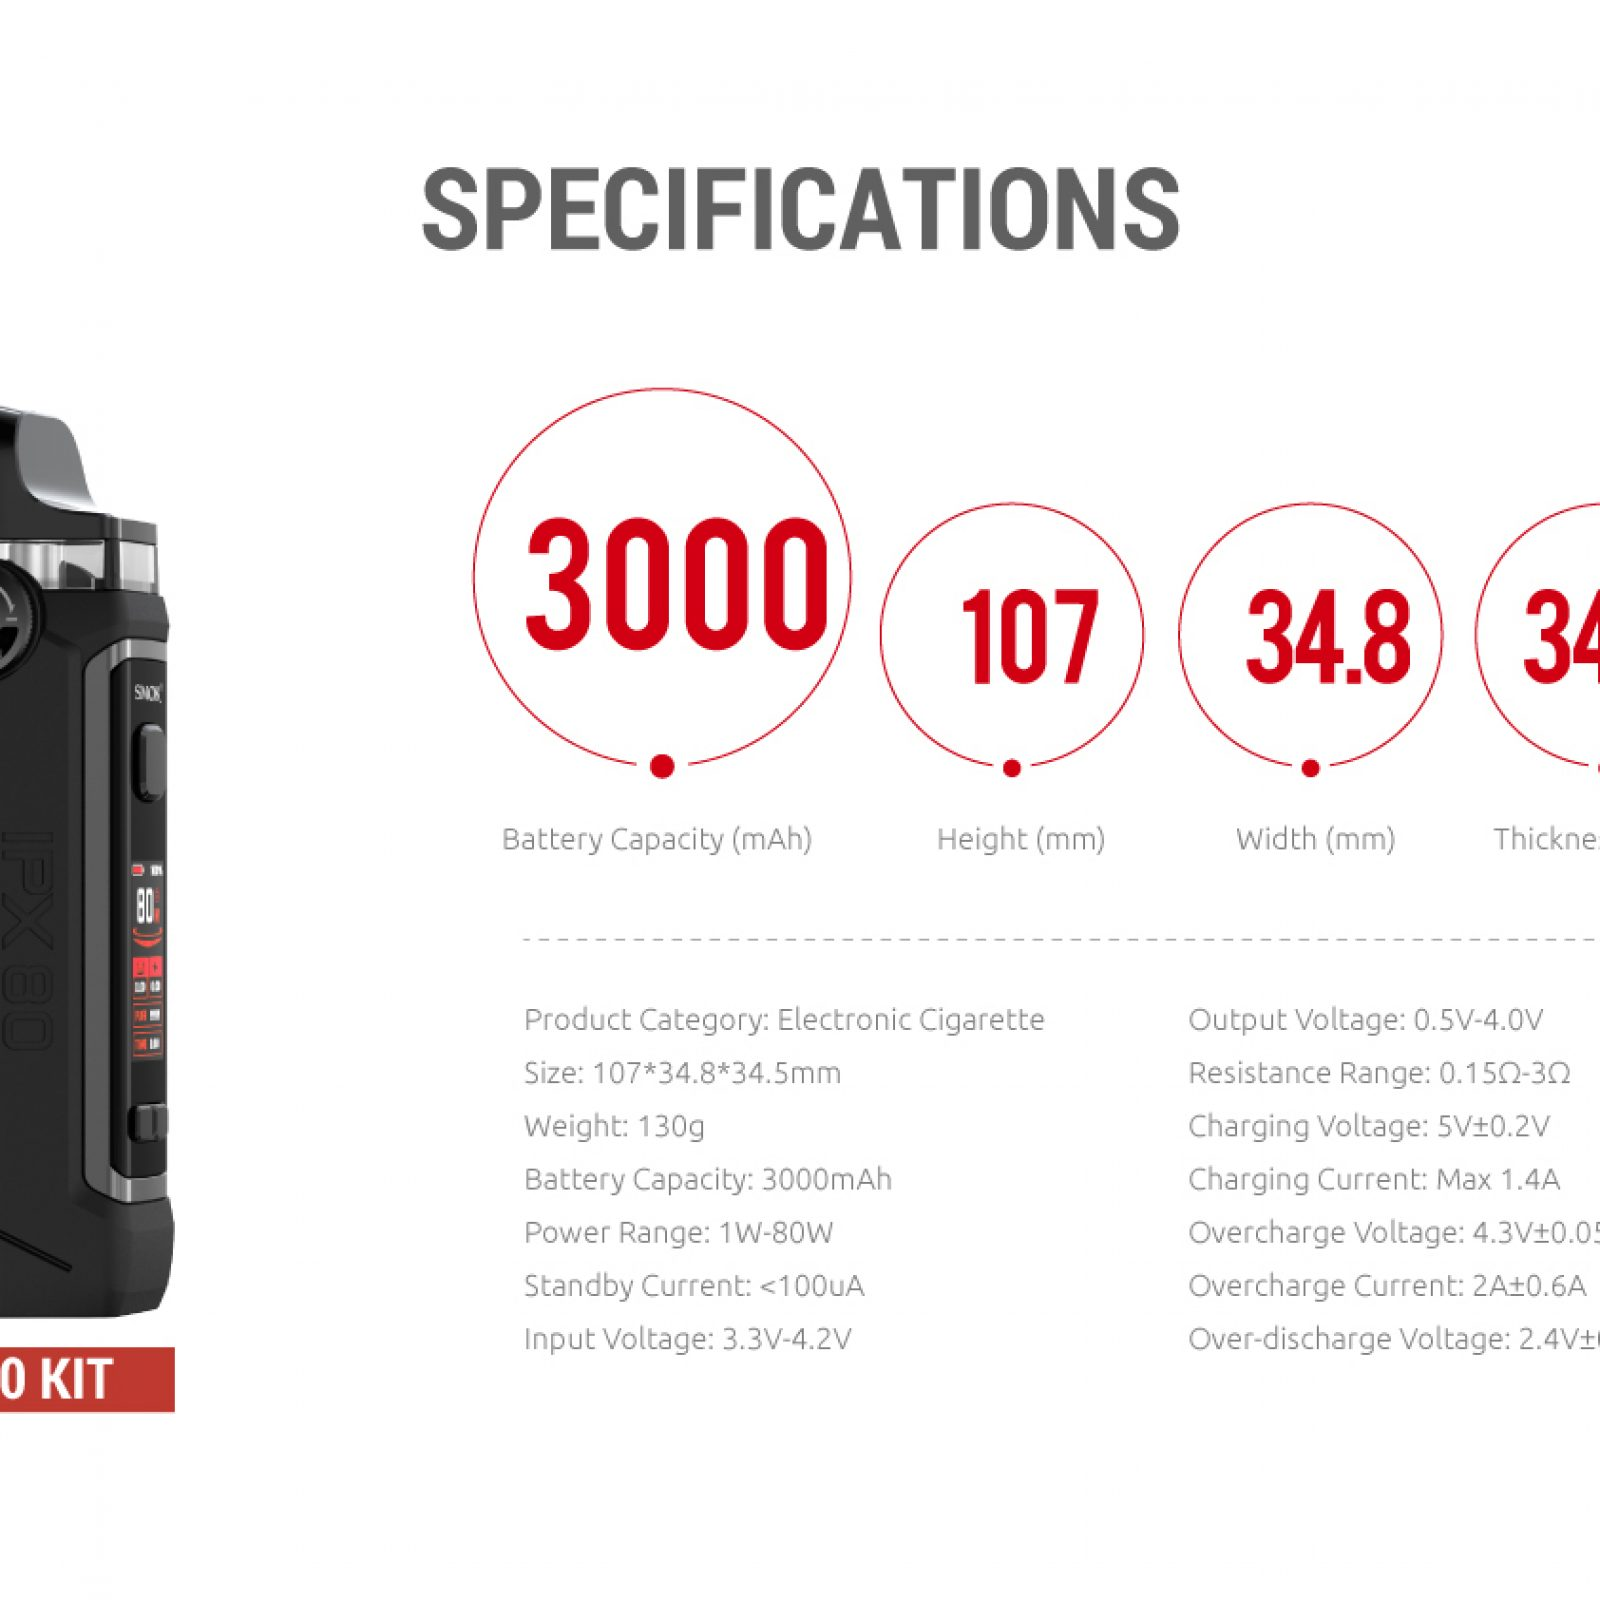 Smok IPX80 specs